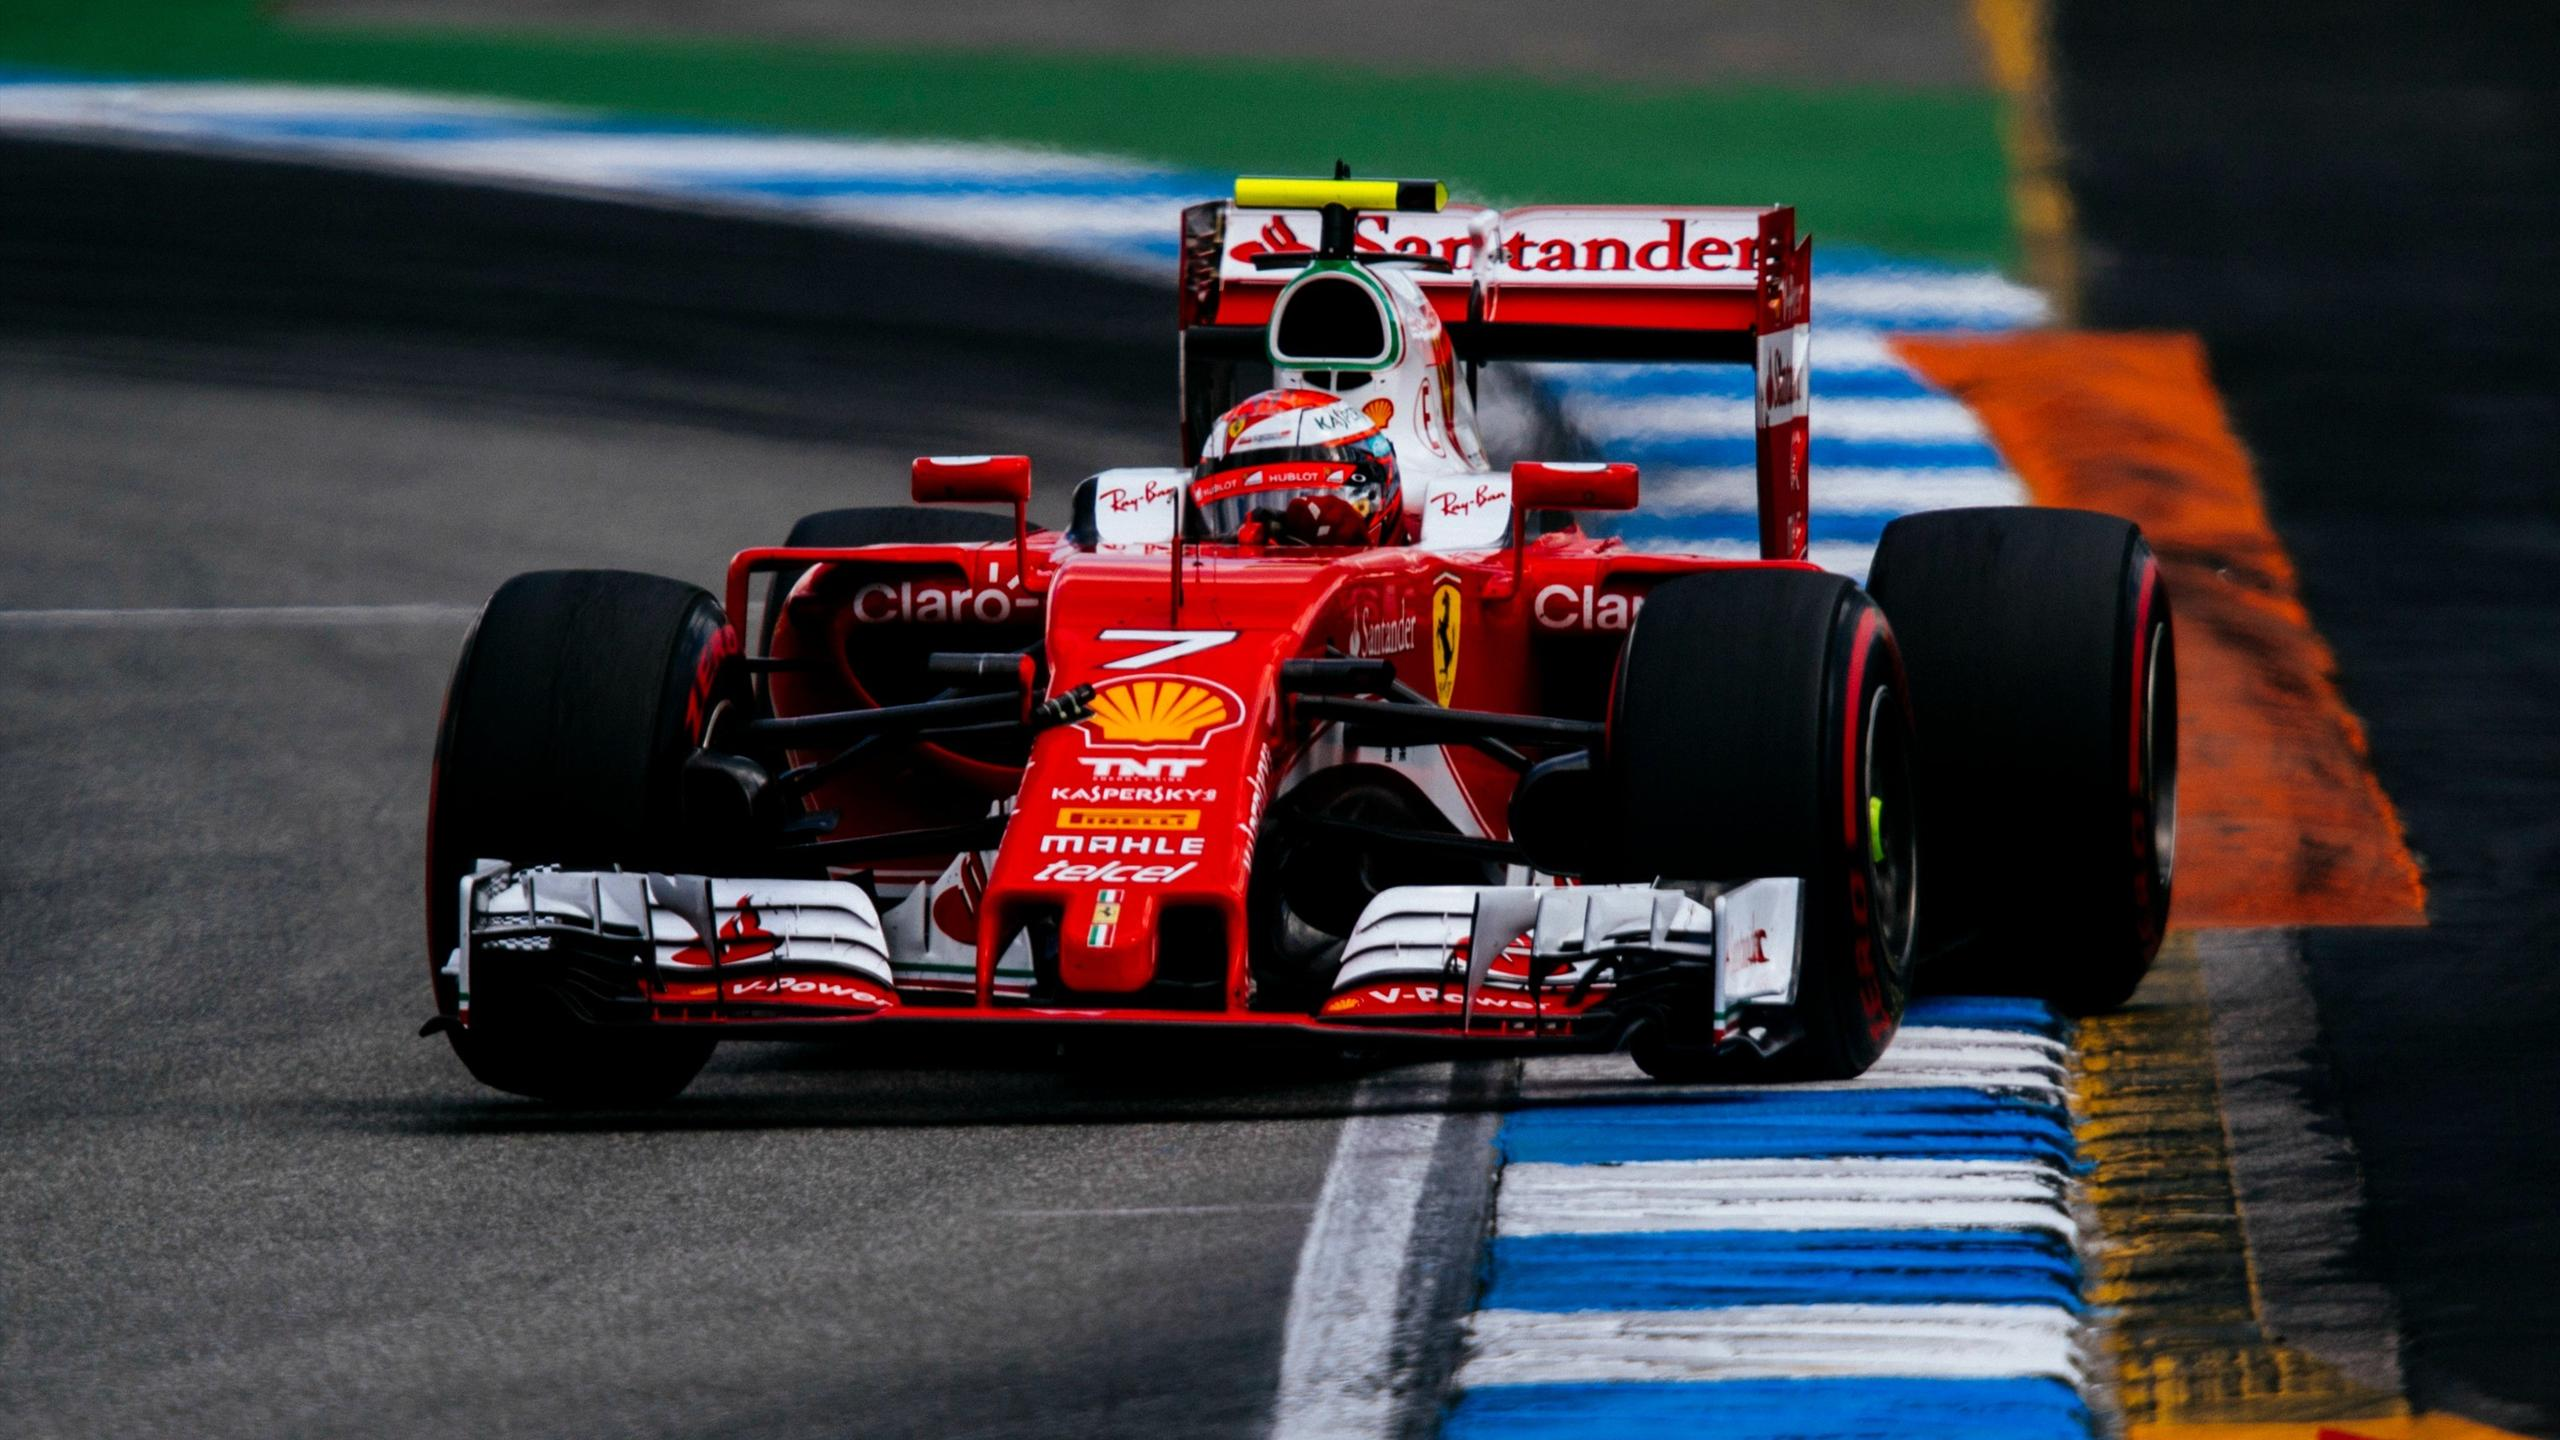 Kimi Räikkönen (Ferrari) au Grand Prix d'Allemagne 2016